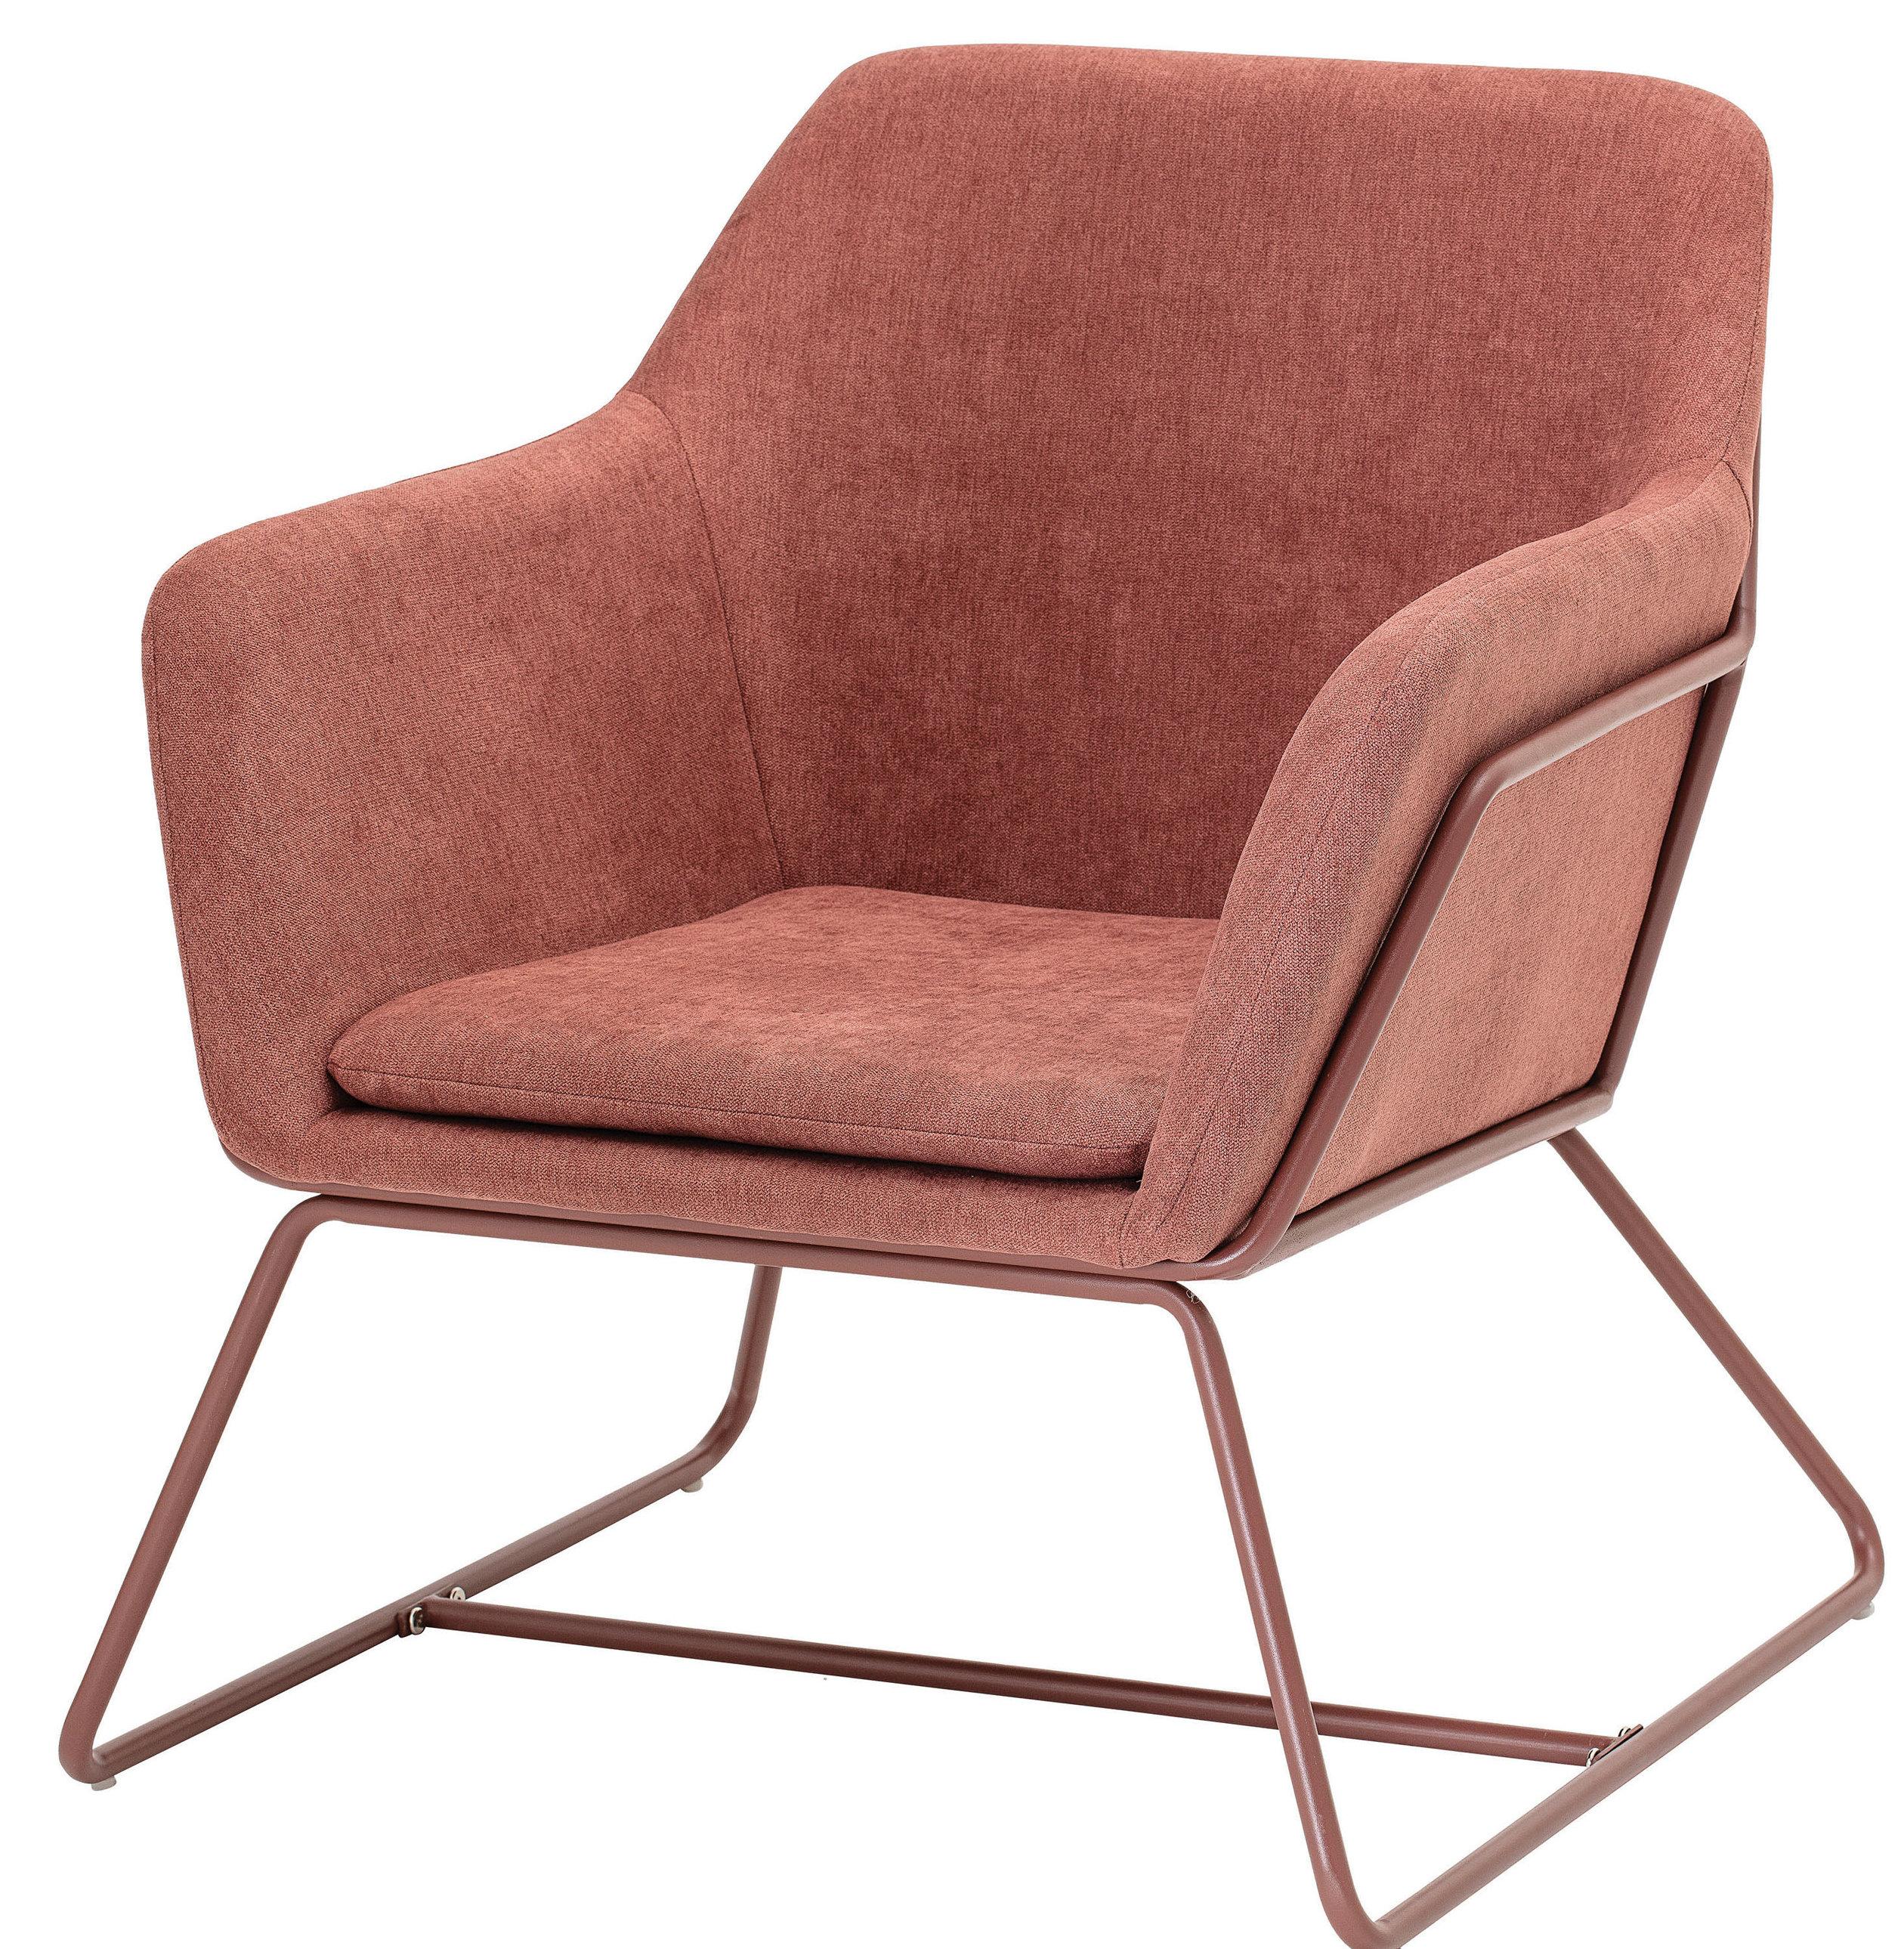 Mercer41 Cohan Large Upholstered Armchair Wayfair